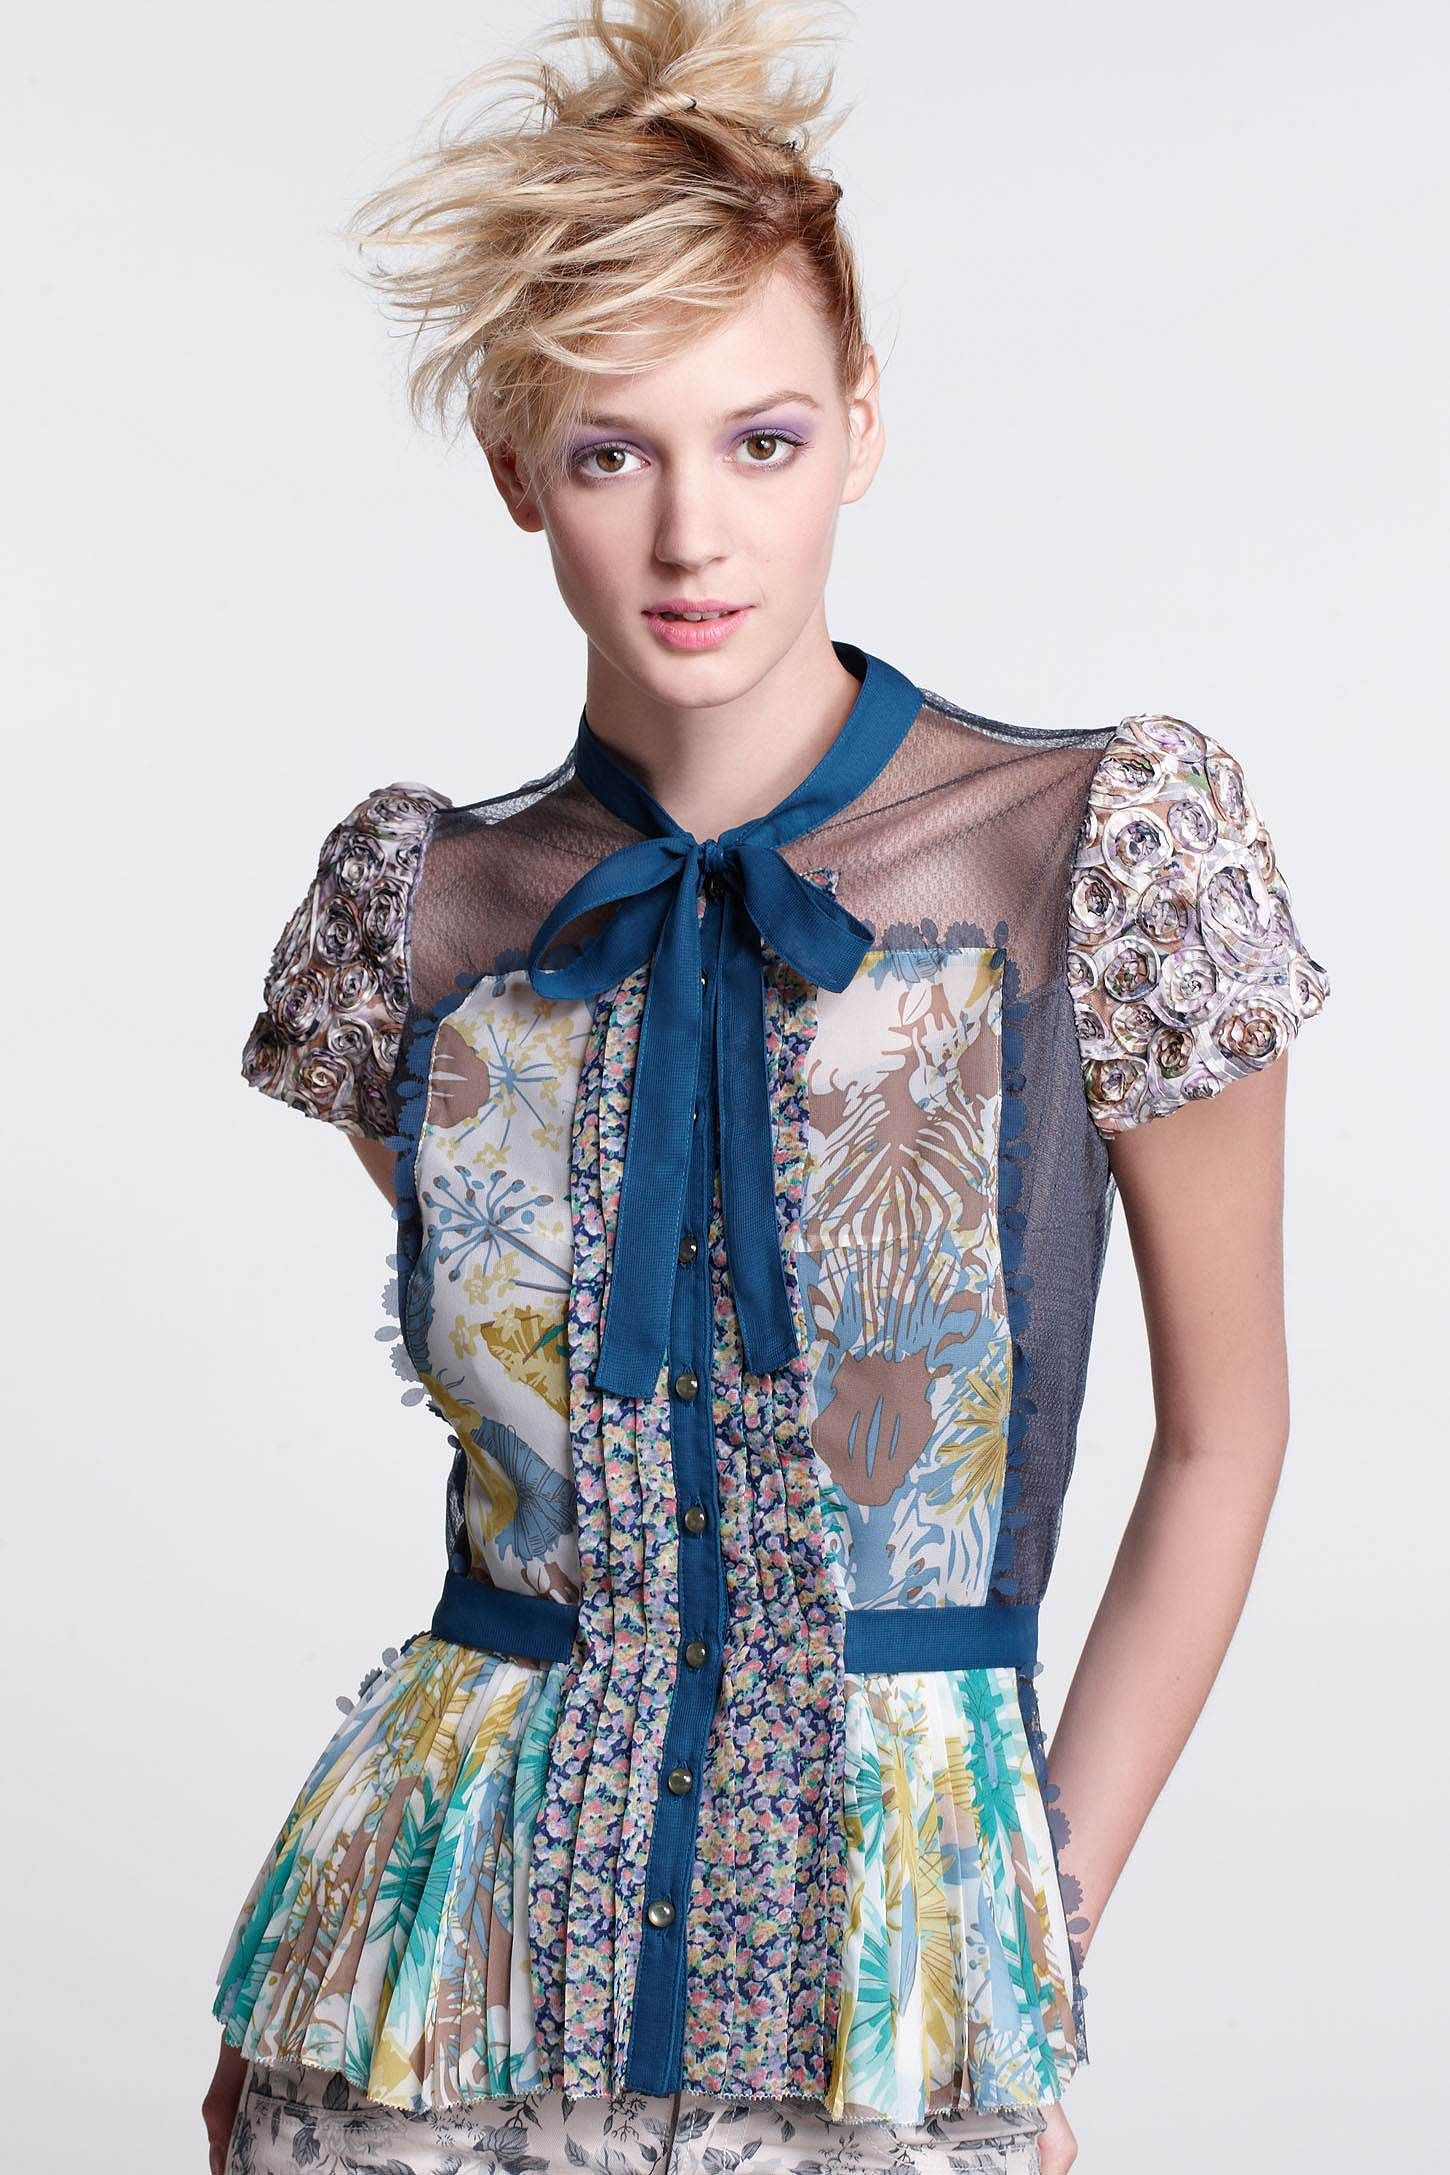 Wilderflora Patchwork Blouse - Anthropologie.com | YS | Style ...